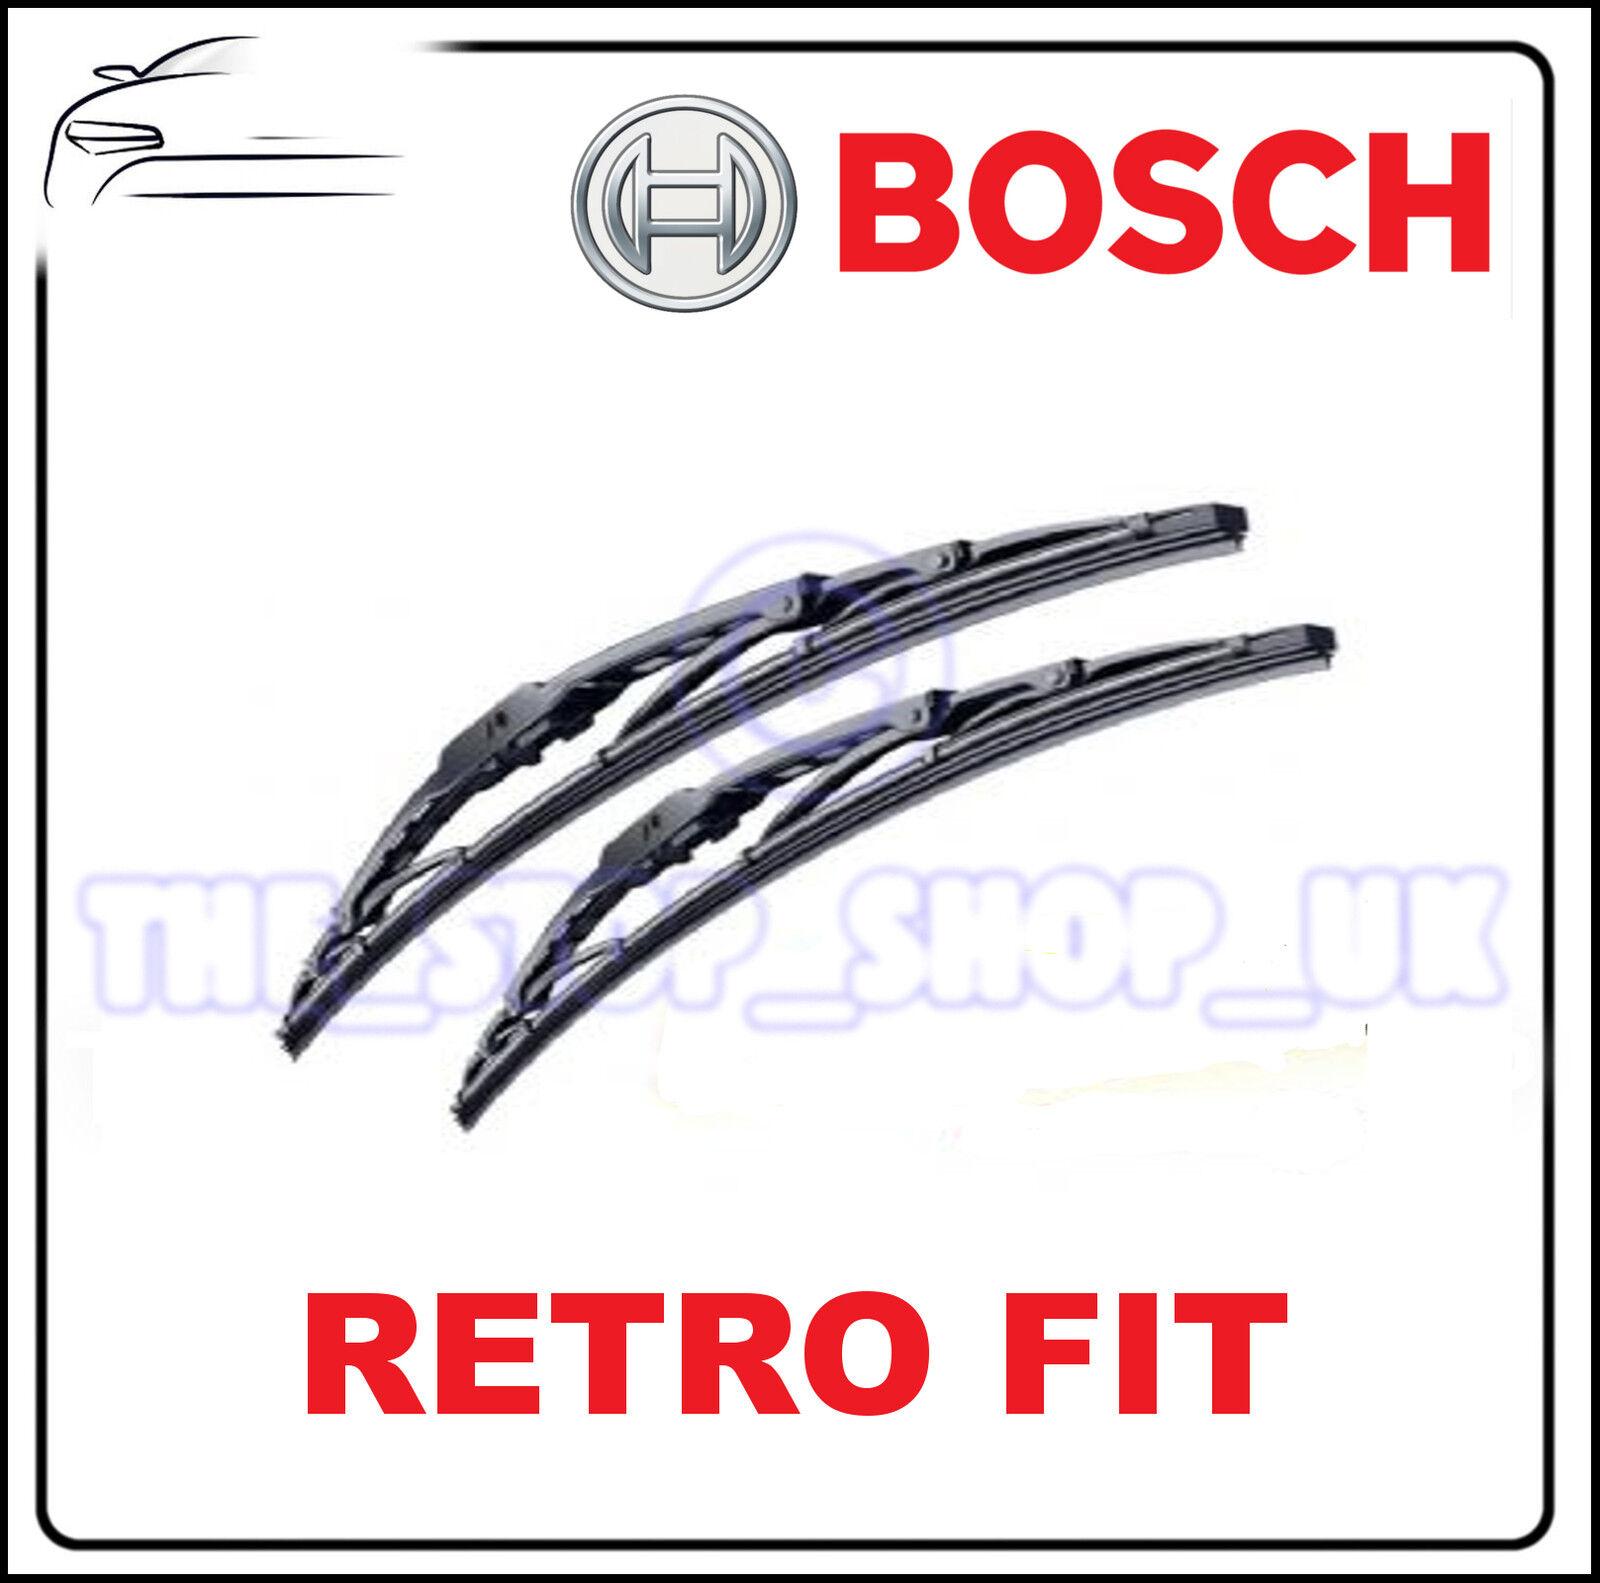 Bosch Aerotwin Retro Front Wiper Blades Genuine OE Quality Windcreen Upgrade